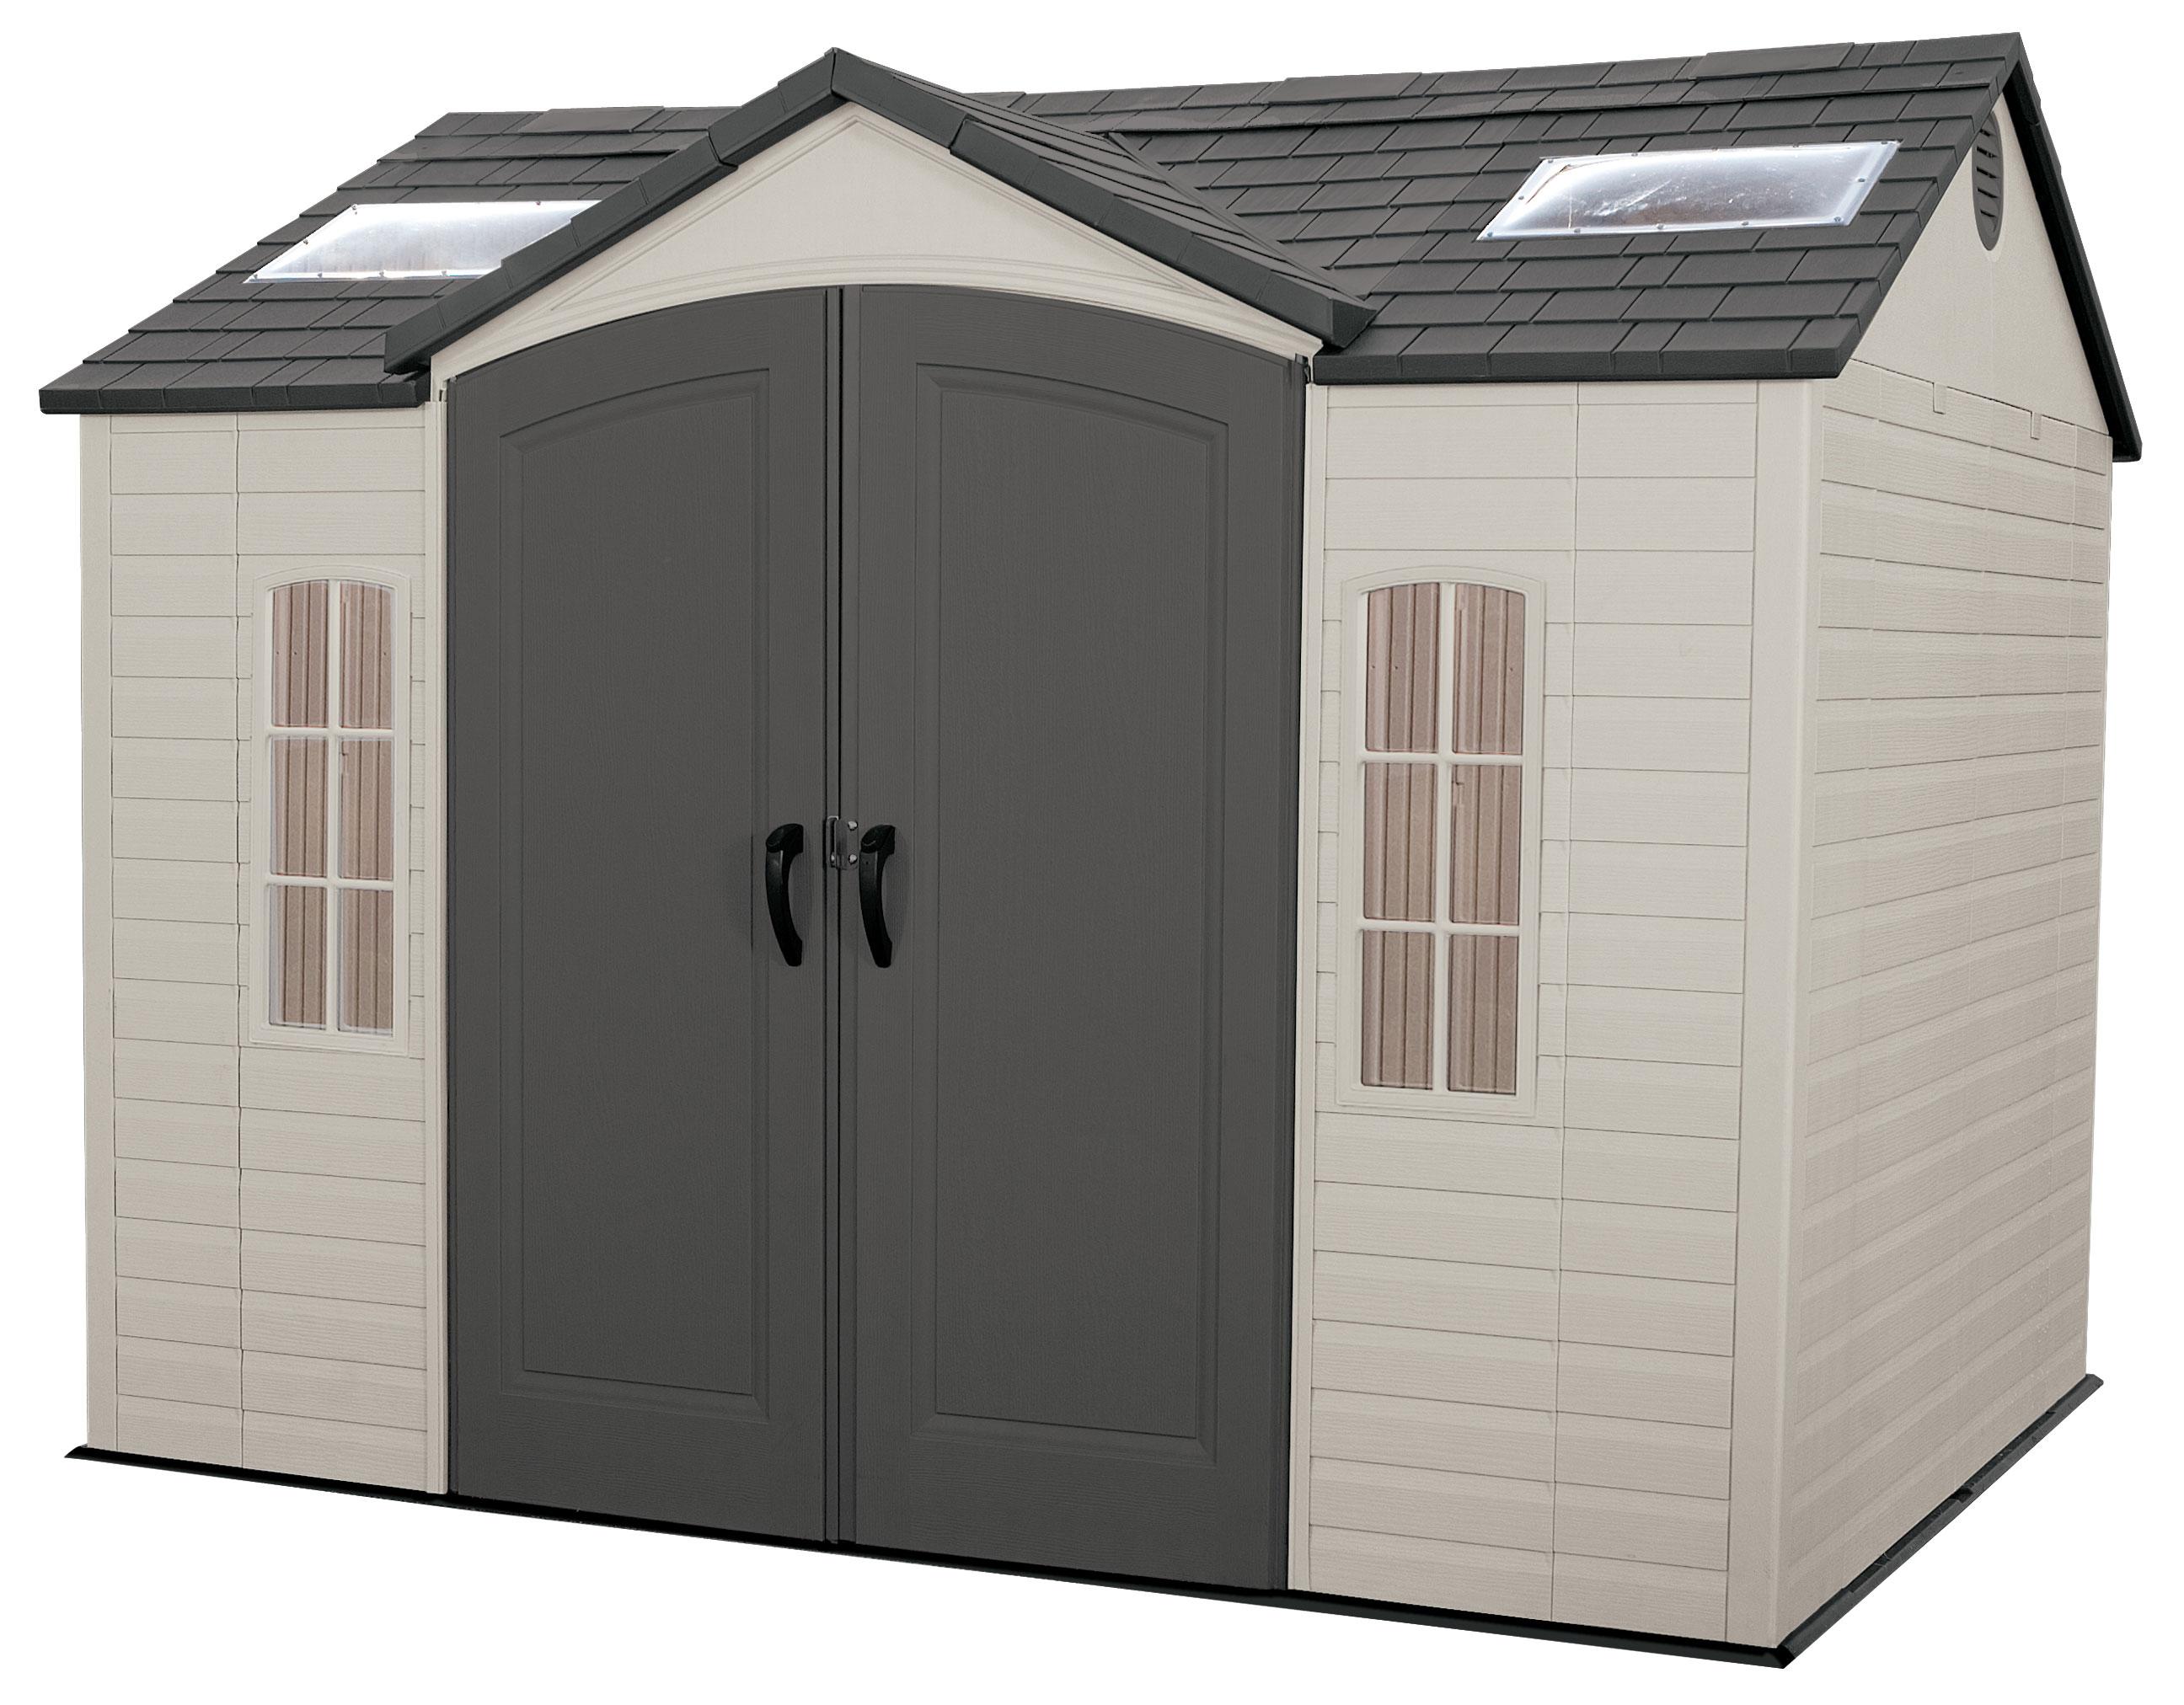 gartenhaus sky online g nstig kaufen. Black Bedroom Furniture Sets. Home Design Ideas